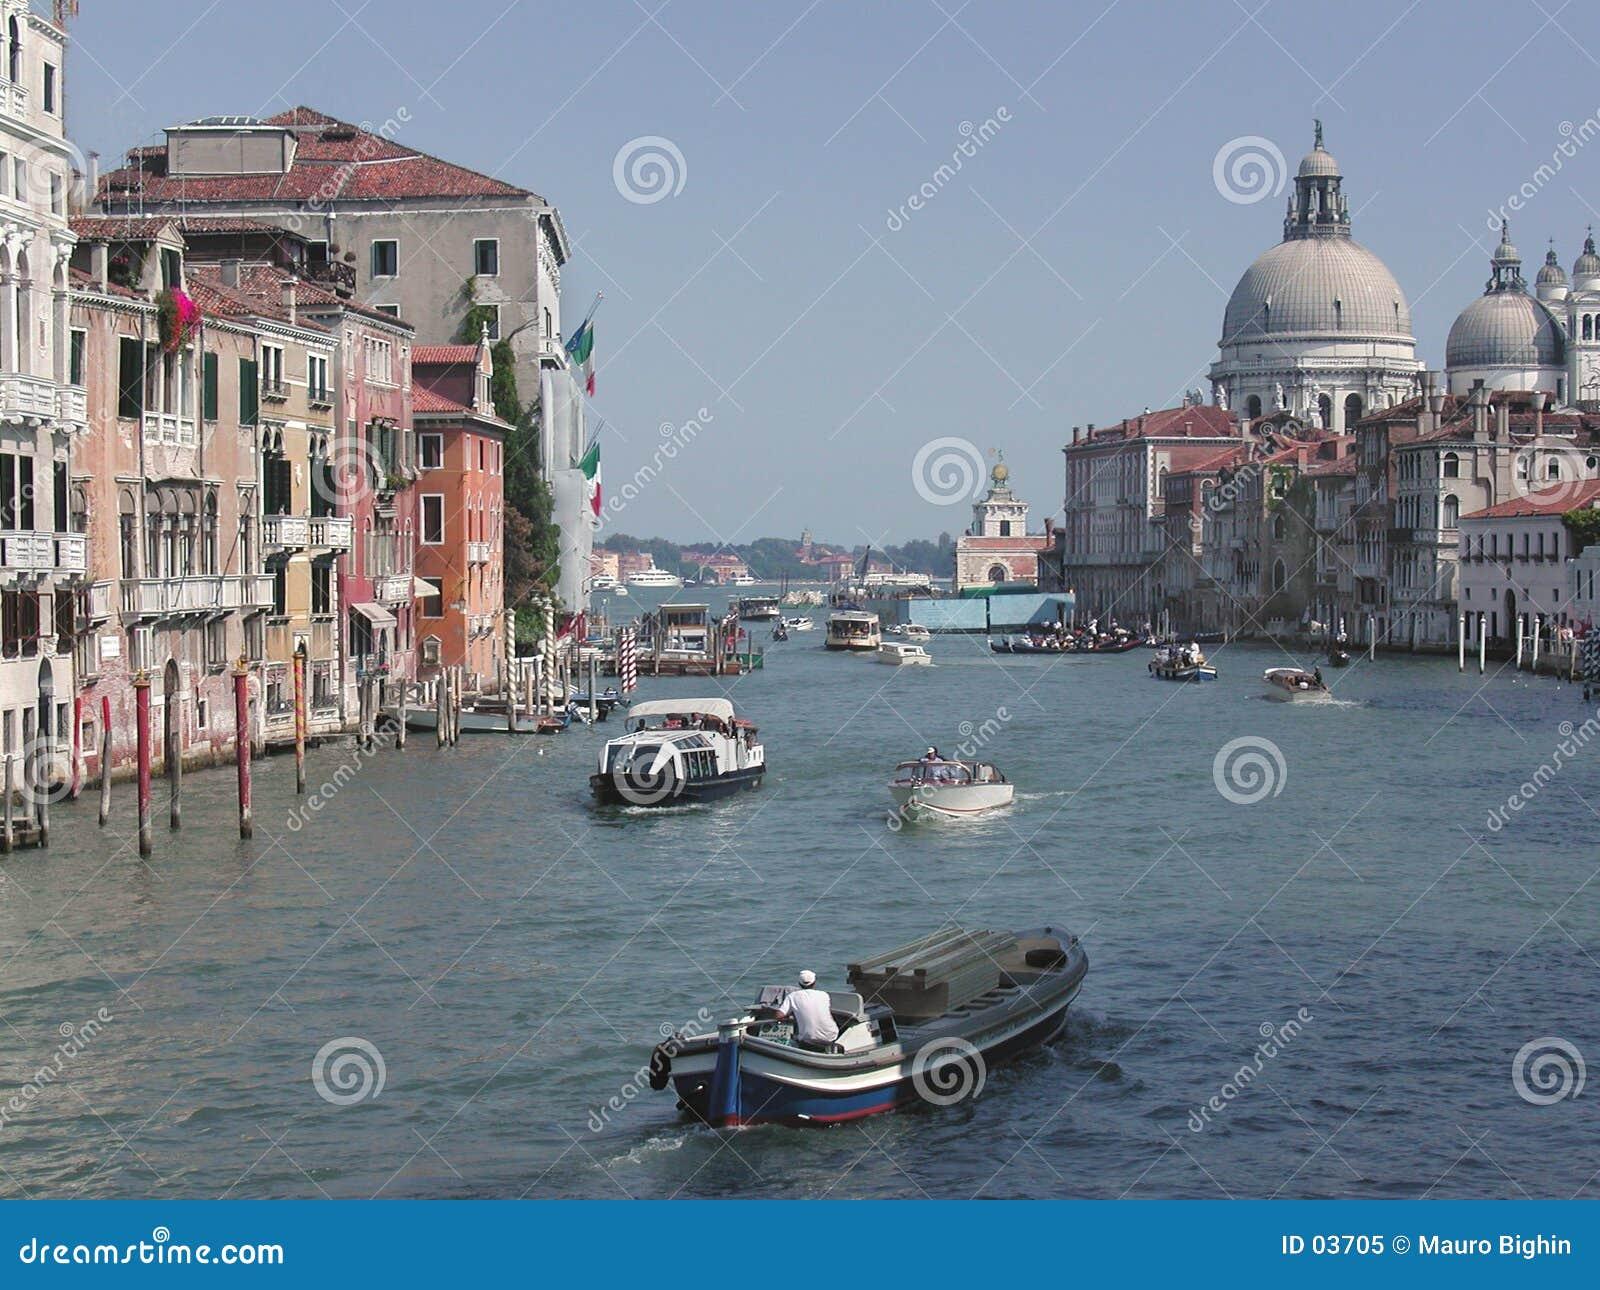 Venice - Italy - Grand Canal